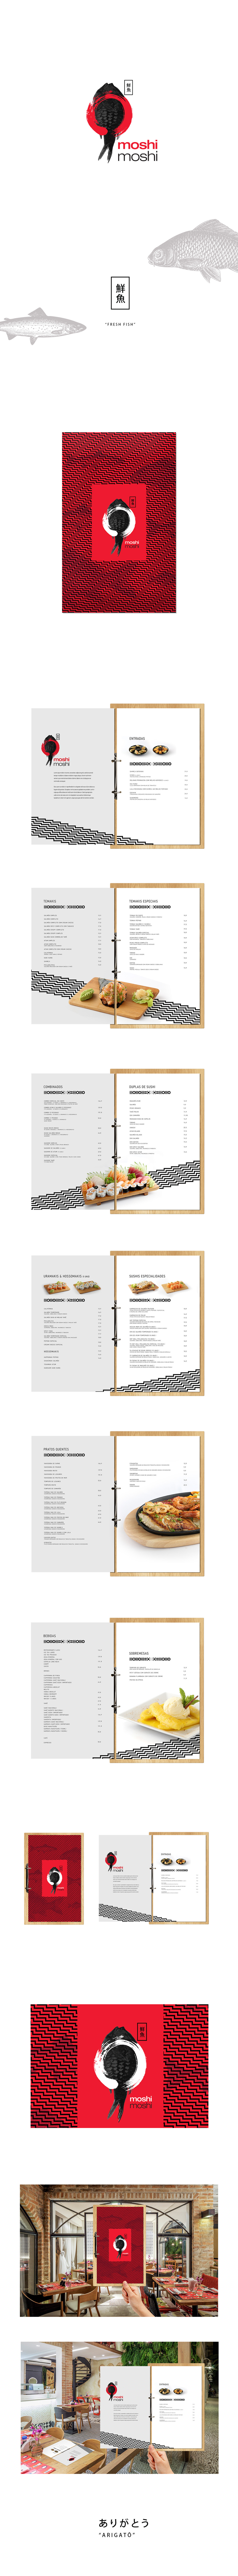 menu restaurant identity japanese fish Food  branding  chef Sushi